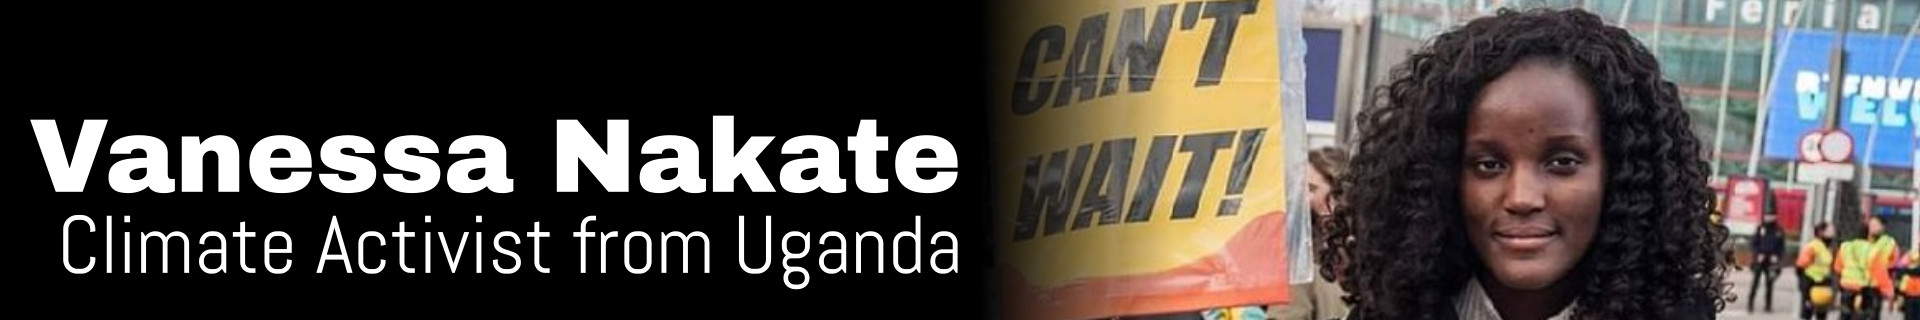 Vanessa Nakate - Climate Activist from Uganda